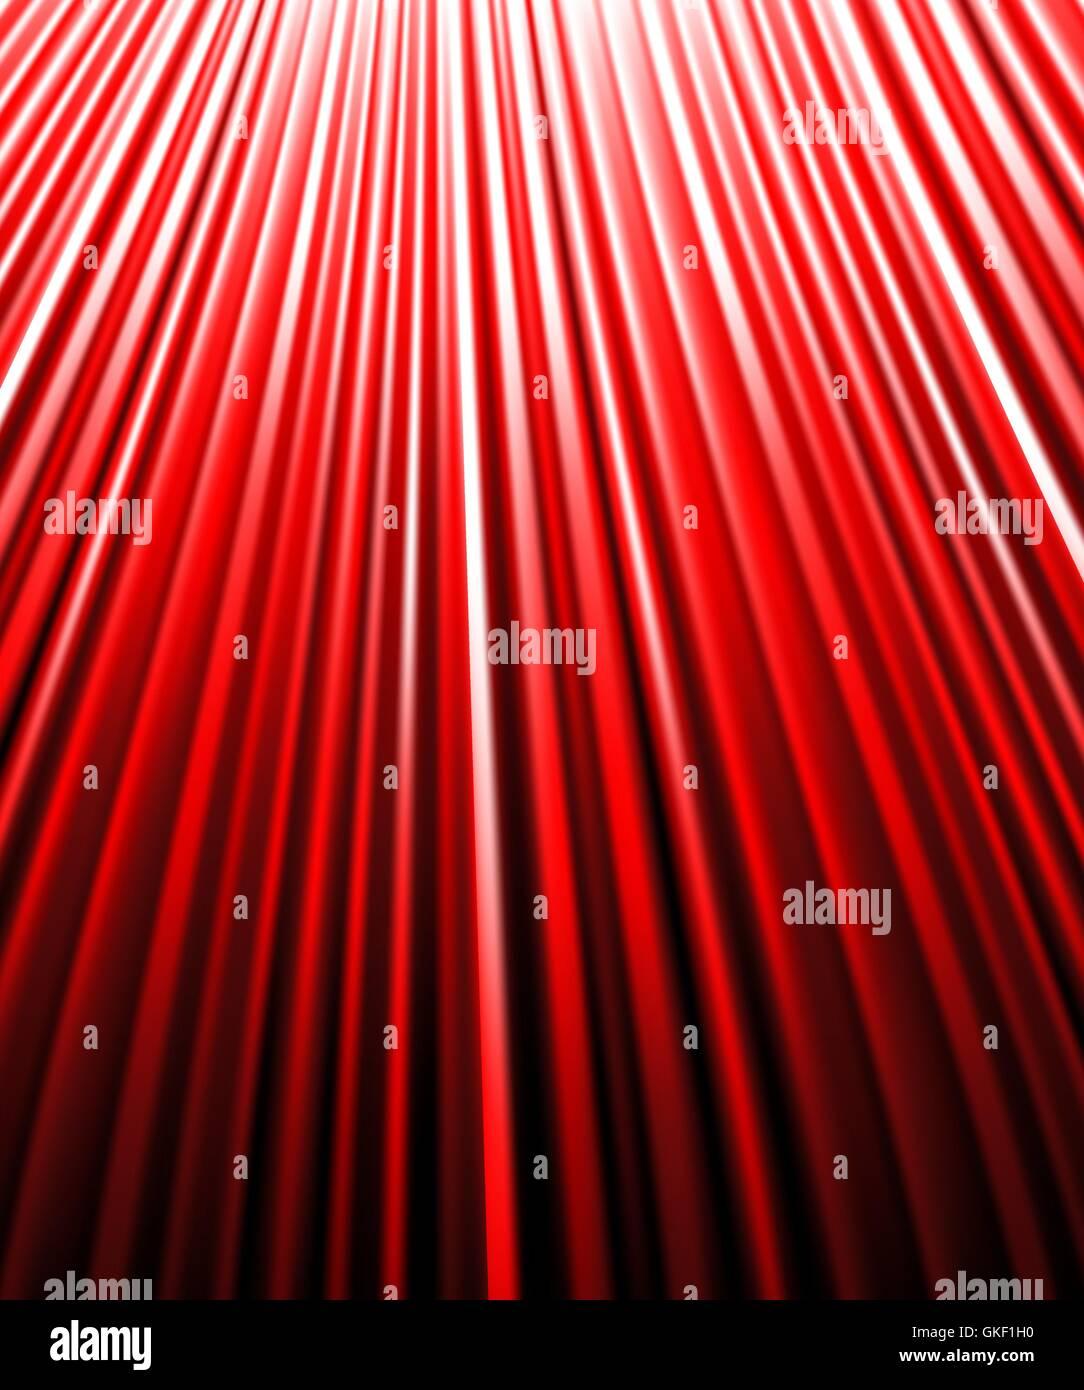 background of red luminous rays. - Stock Image